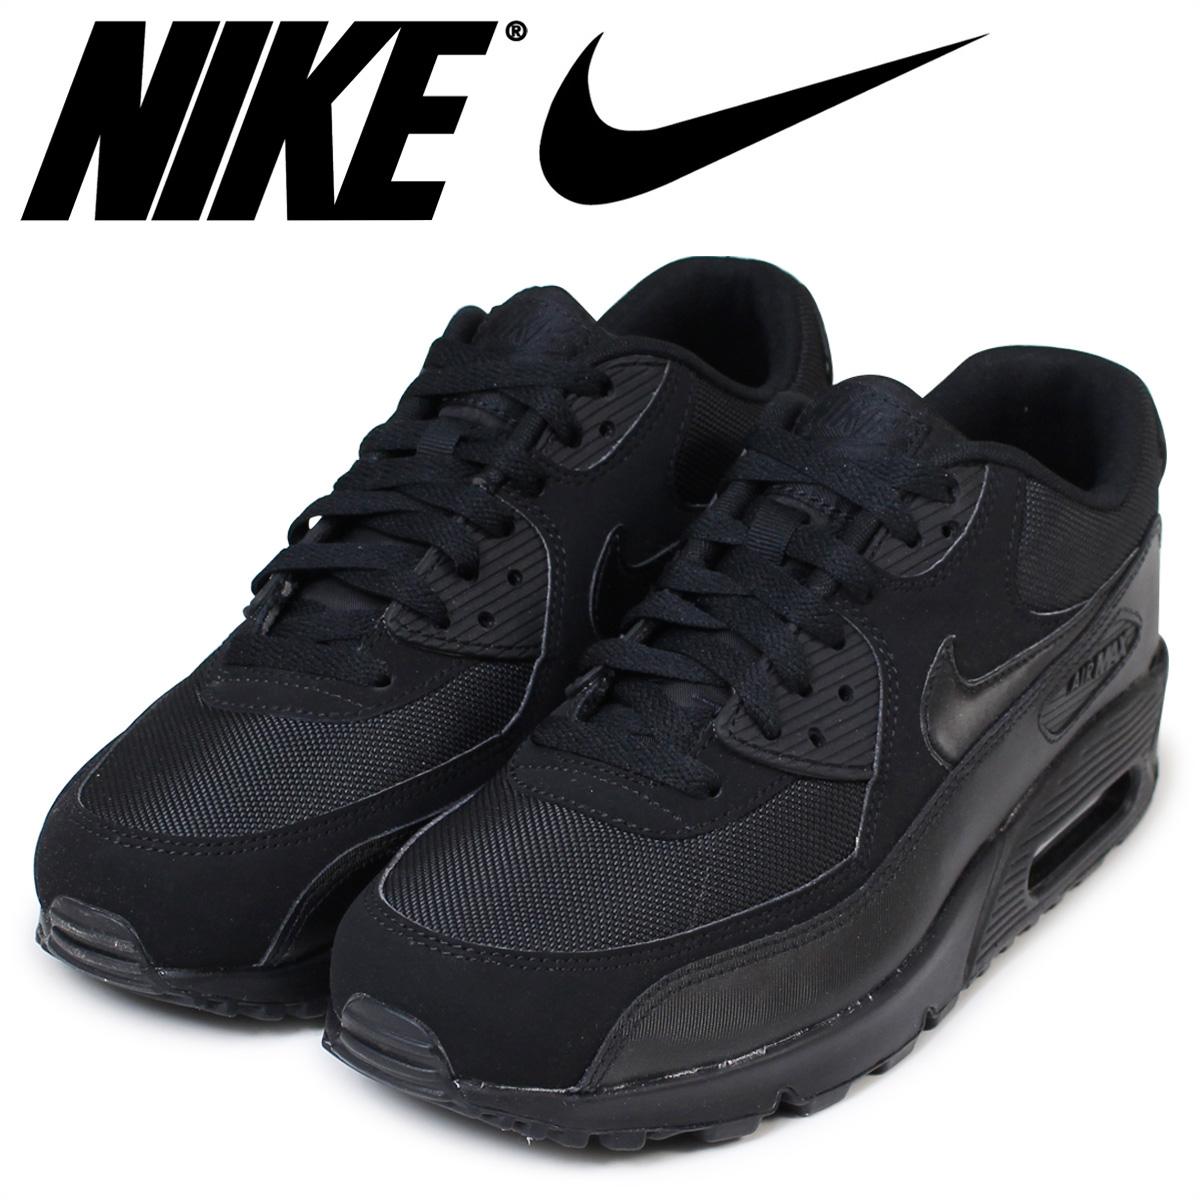 Nike Air Max Essential 90 Schwarz